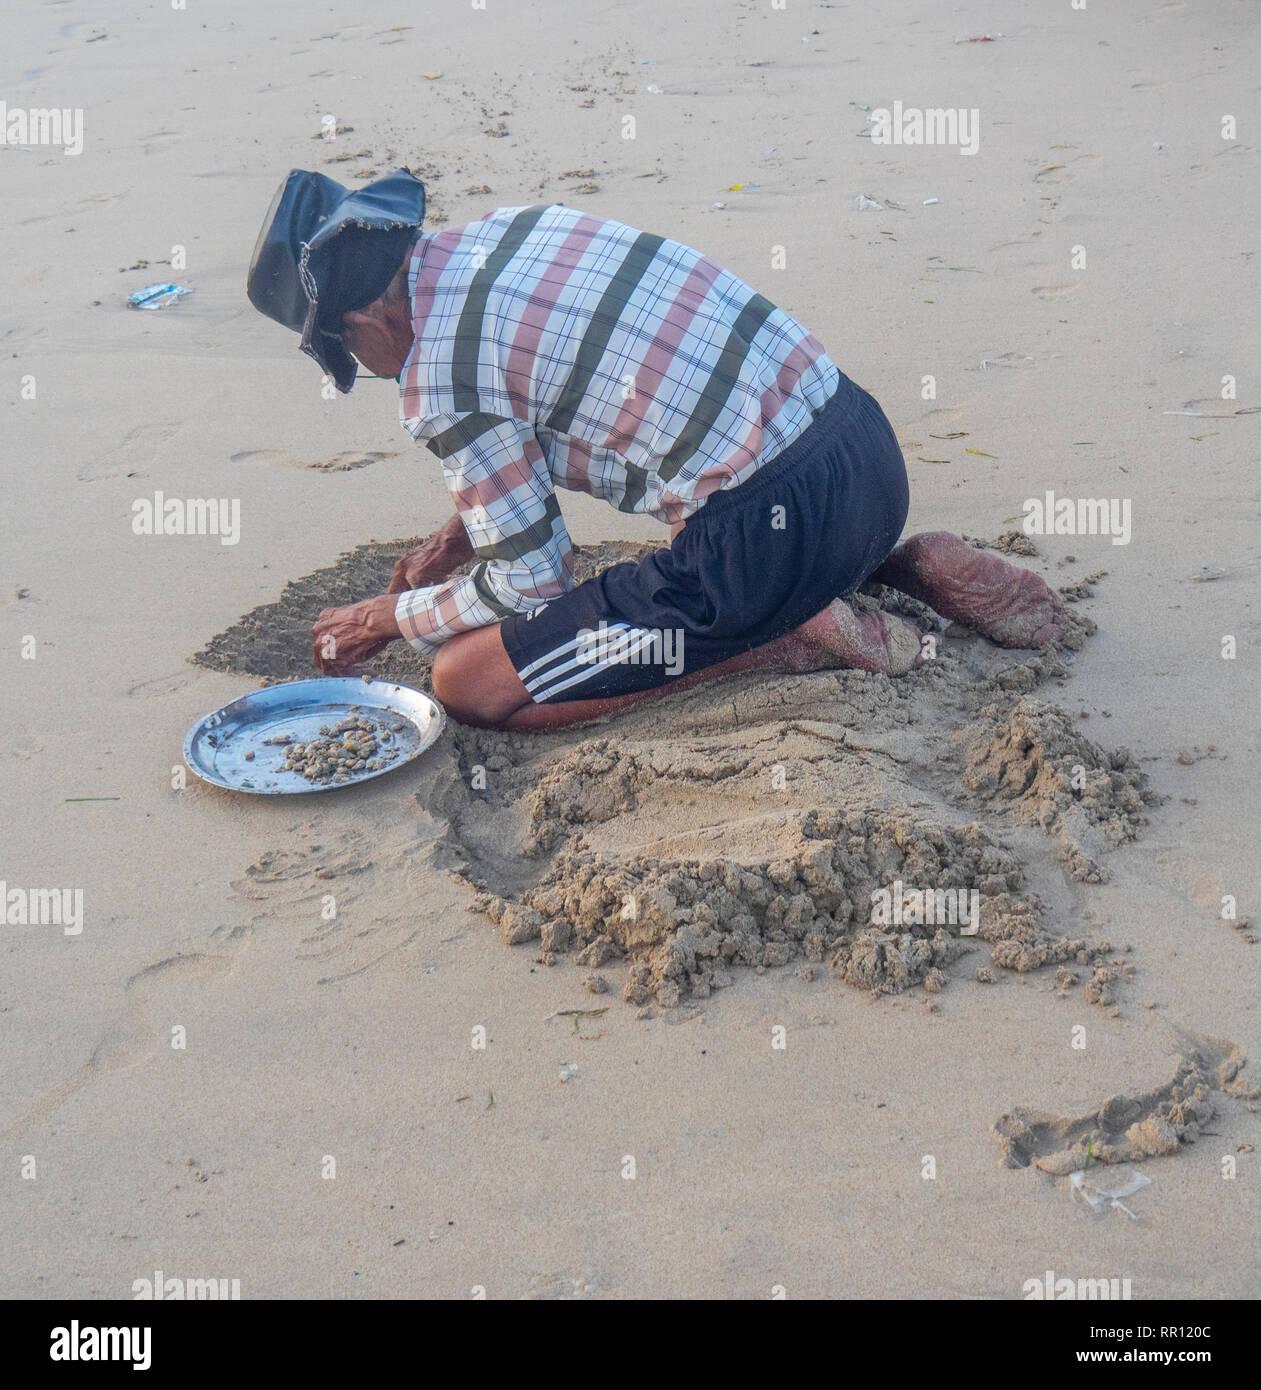 A man digging up beach sand to  collect cockle shells at the beach at Jimbaran Bay Bali Indonesia. - Stock Image